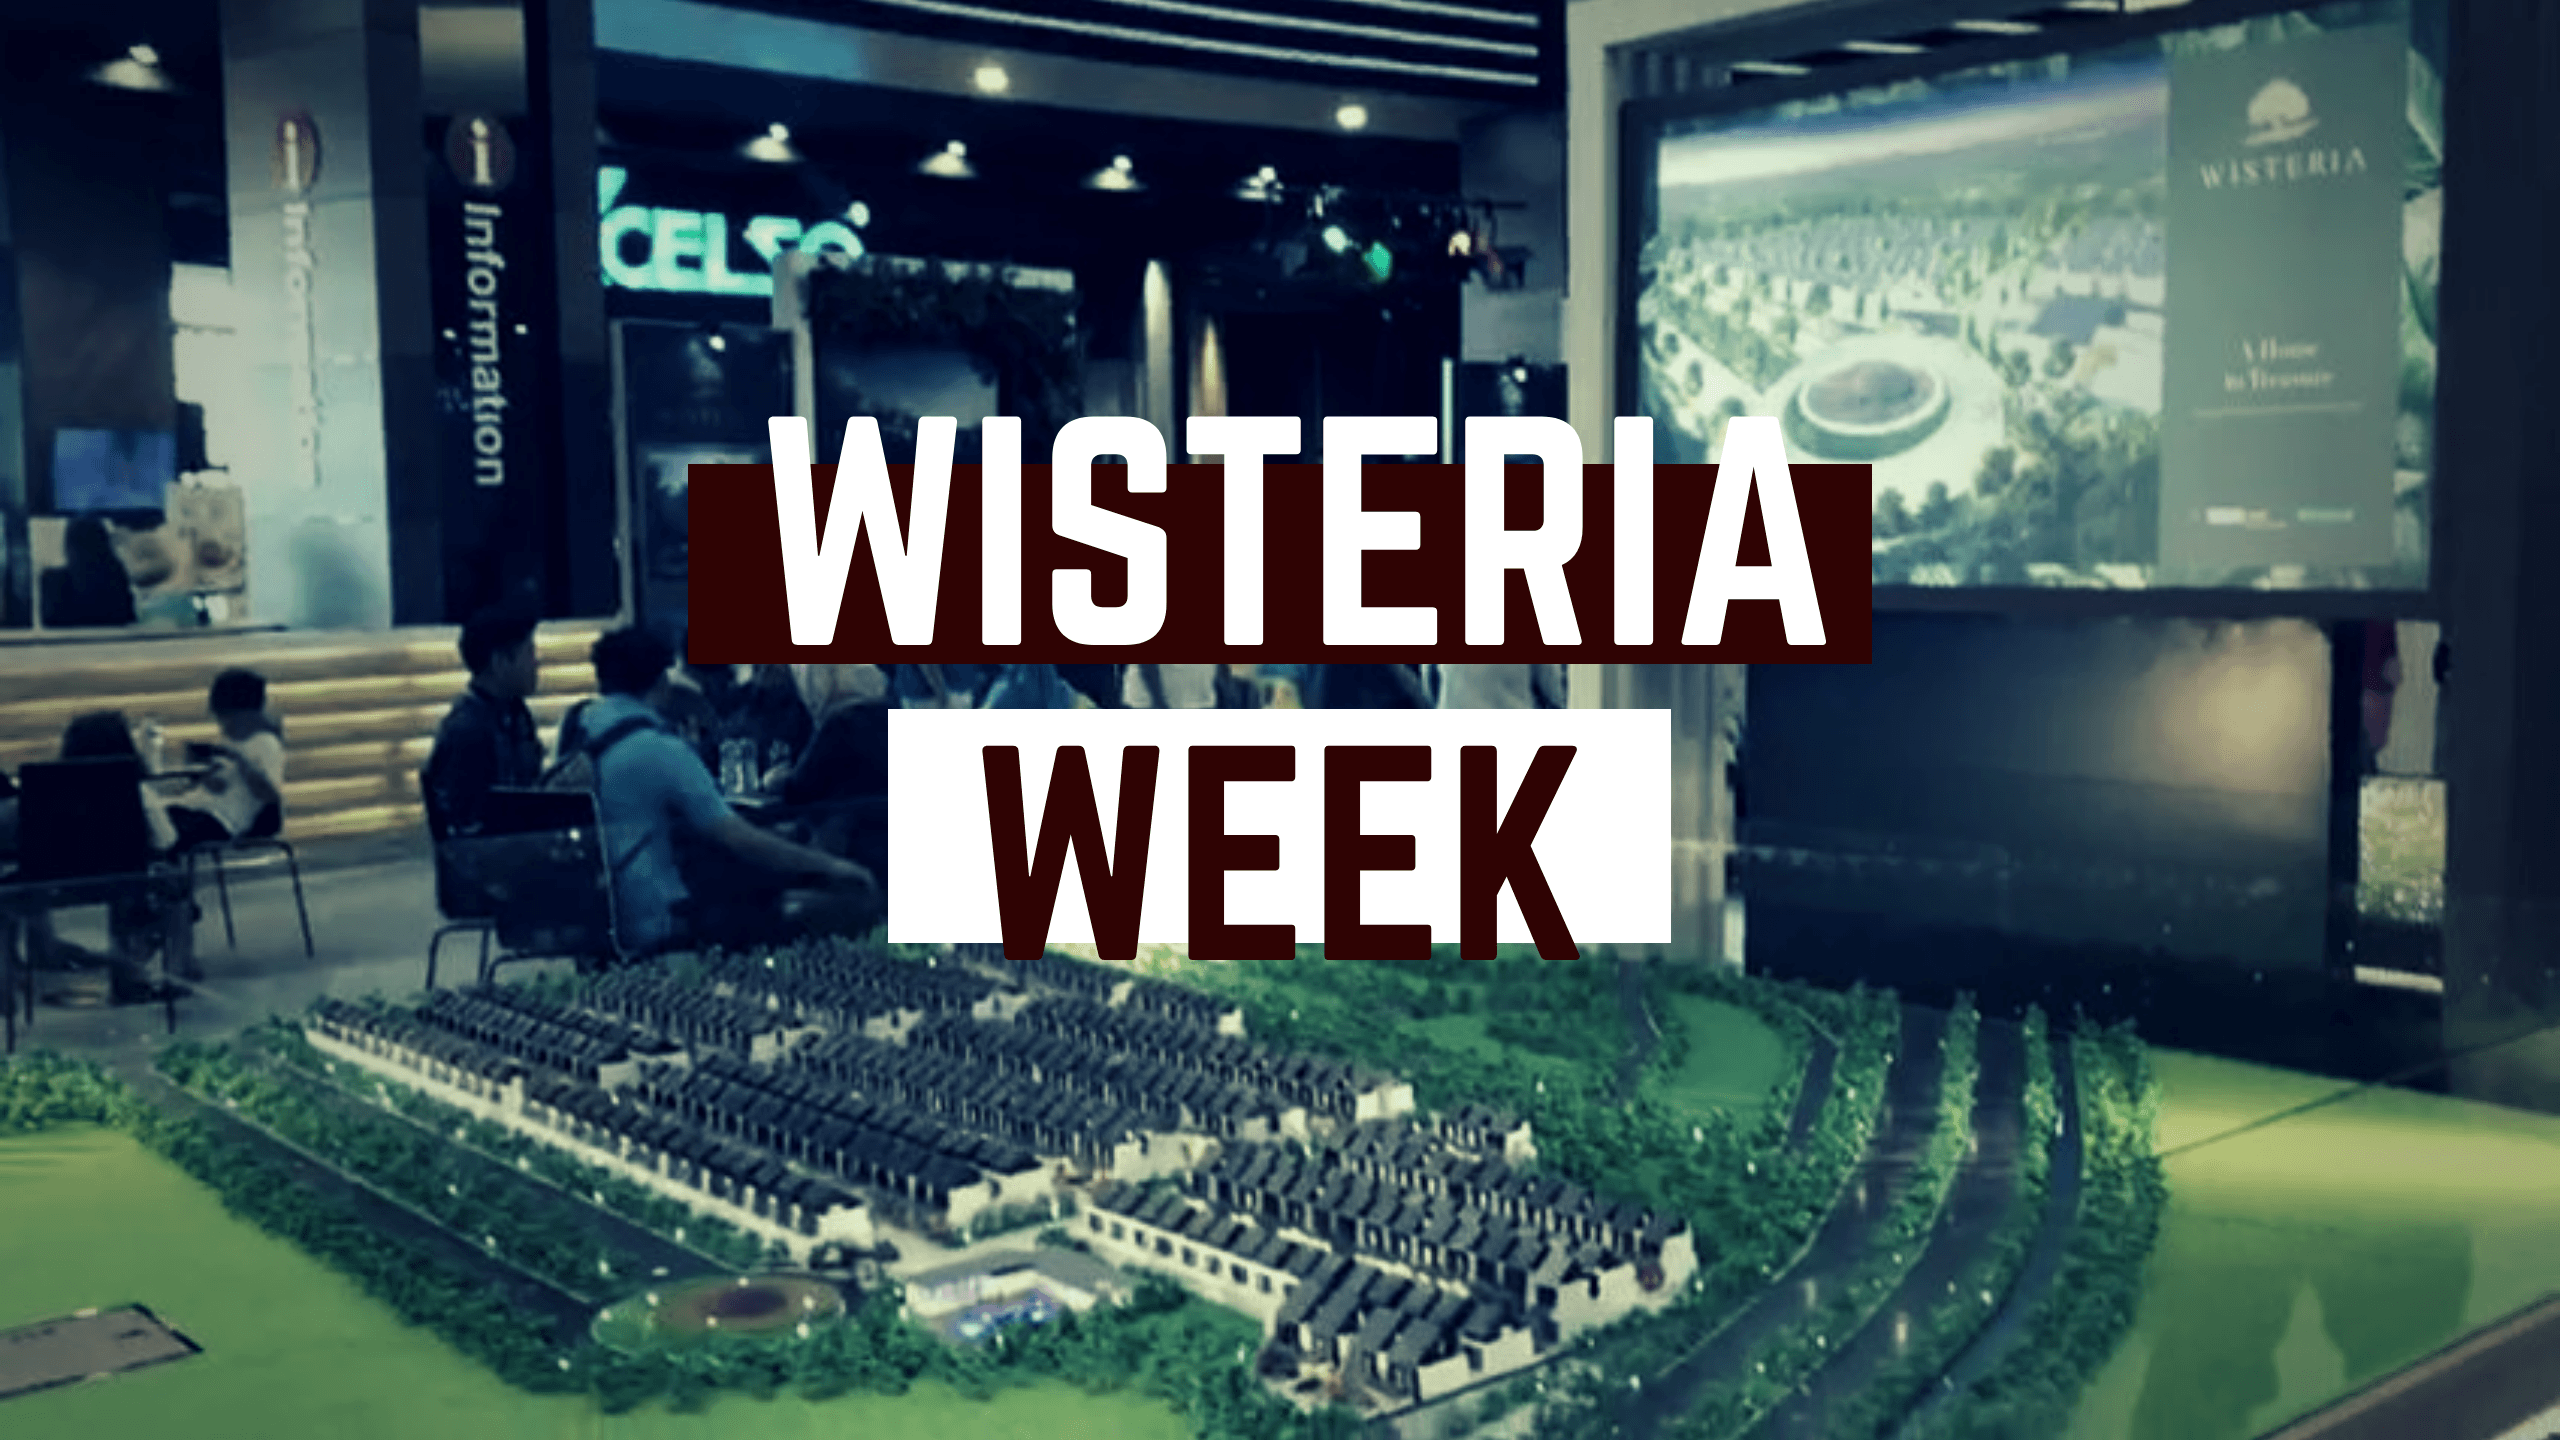 Video Event Wisteria Week 16-17 Nov 2019